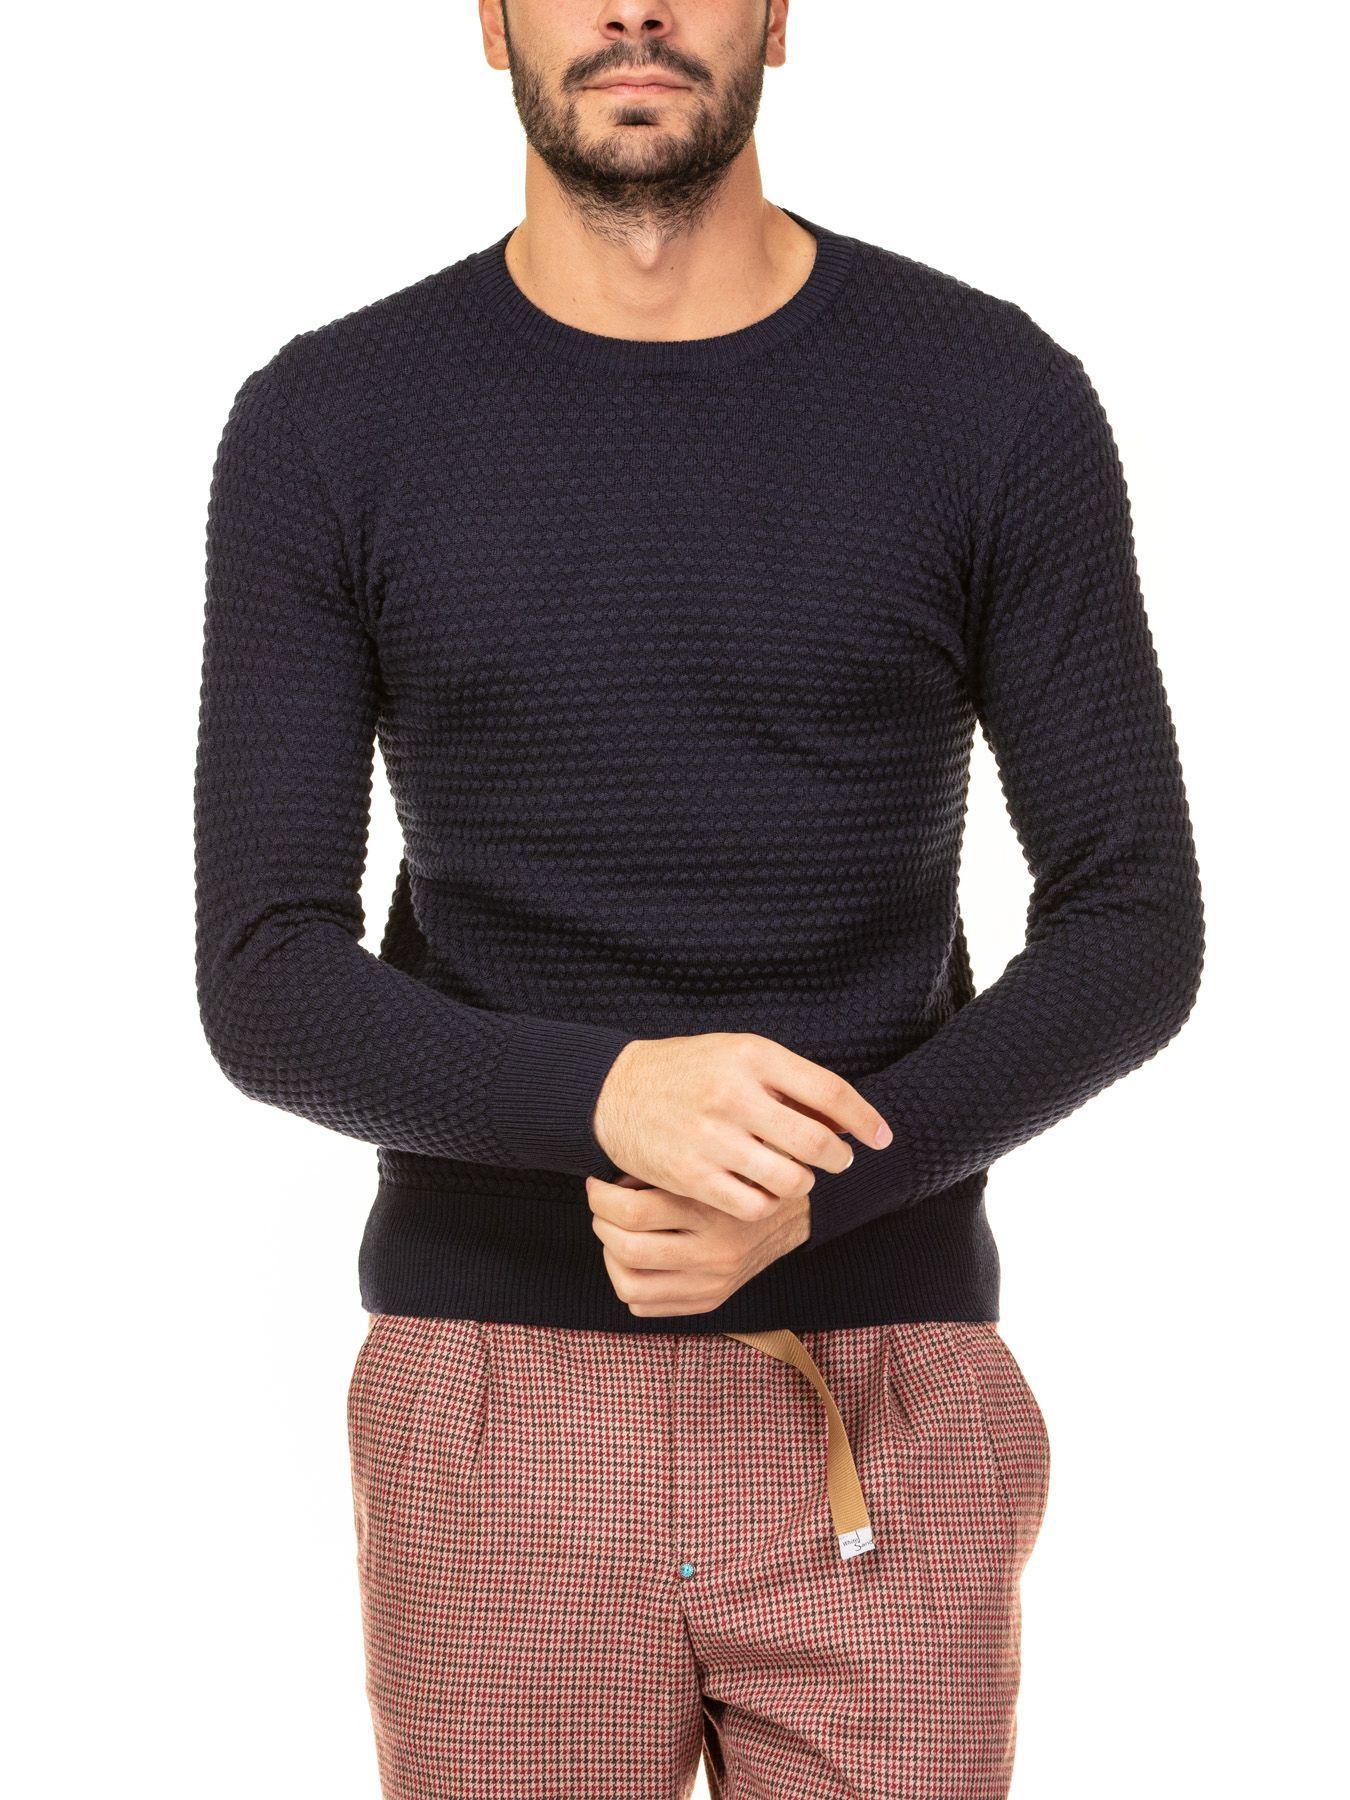 G.R.P. Crewneck Sweater